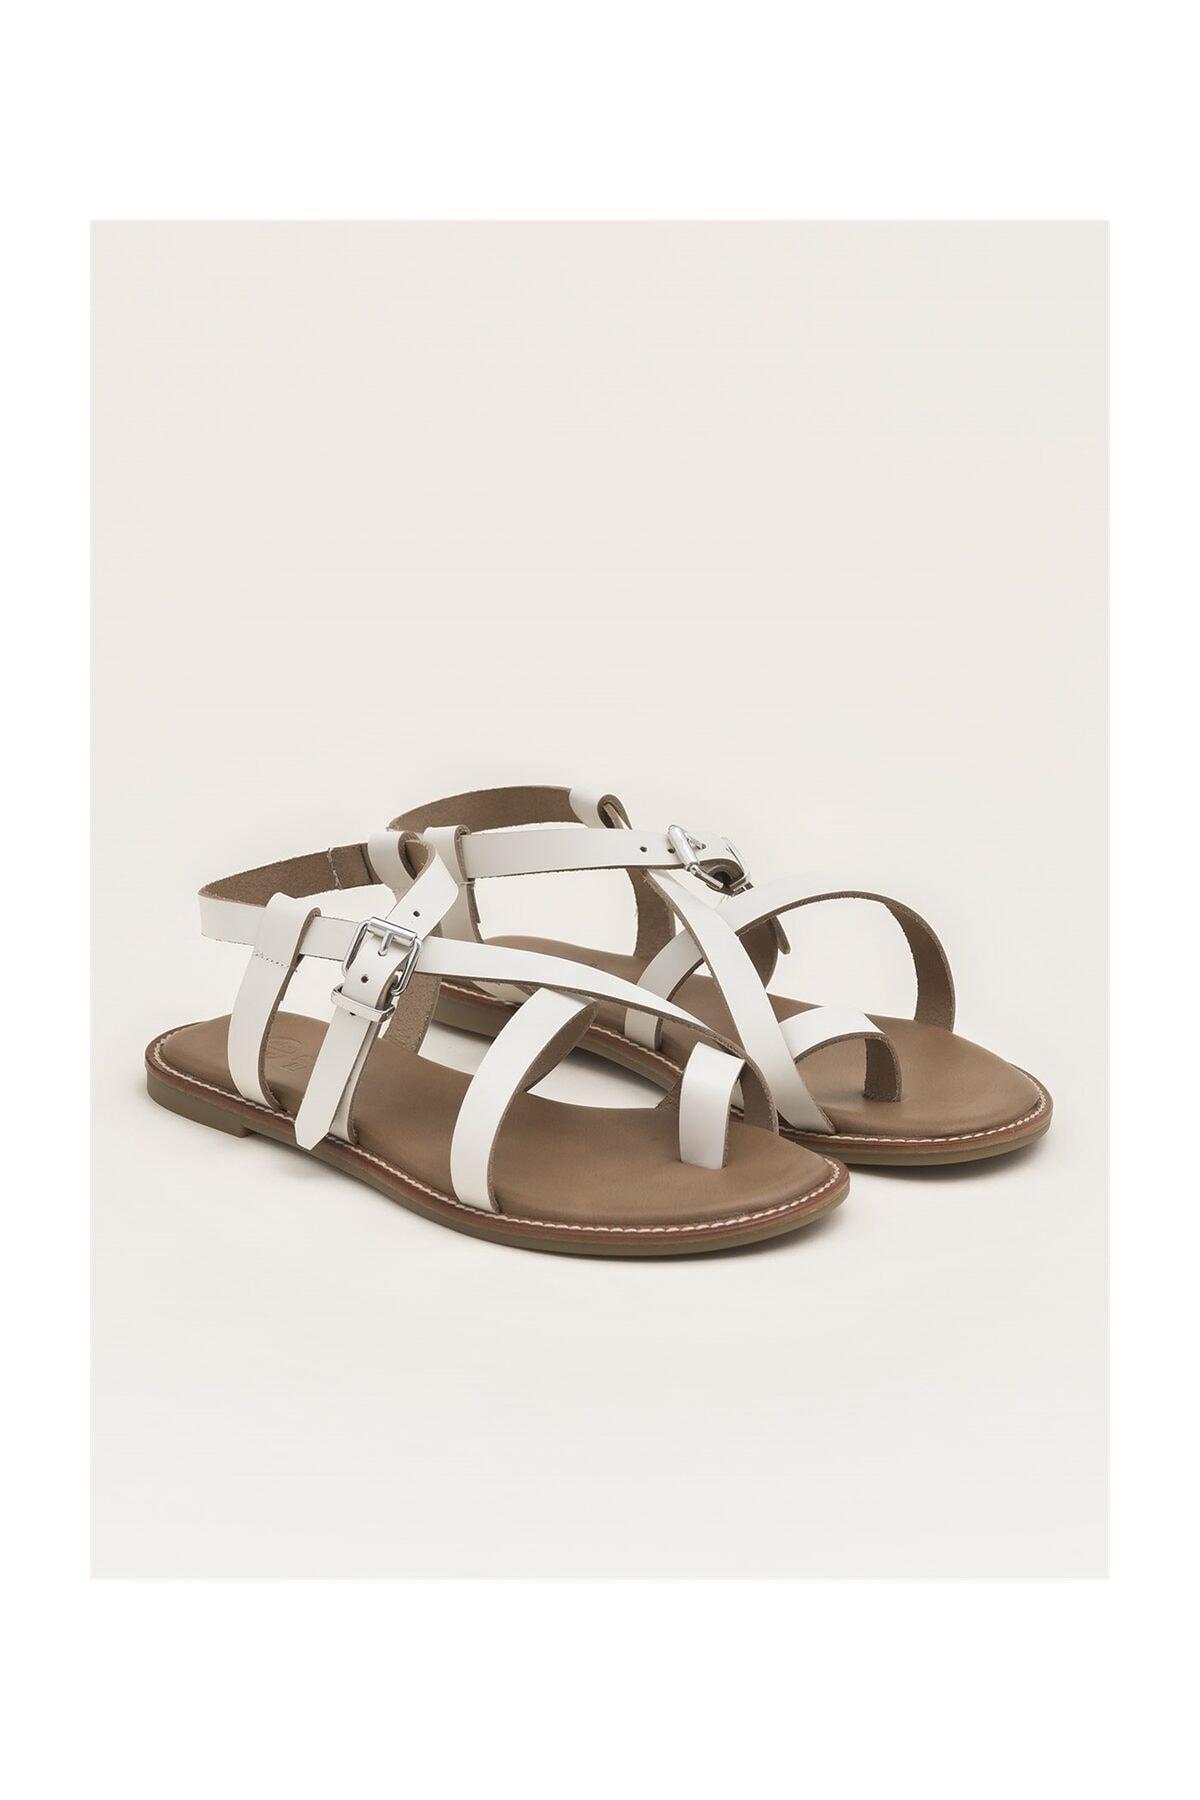 Elle Shoes Elayne Kadın Sandalet 2